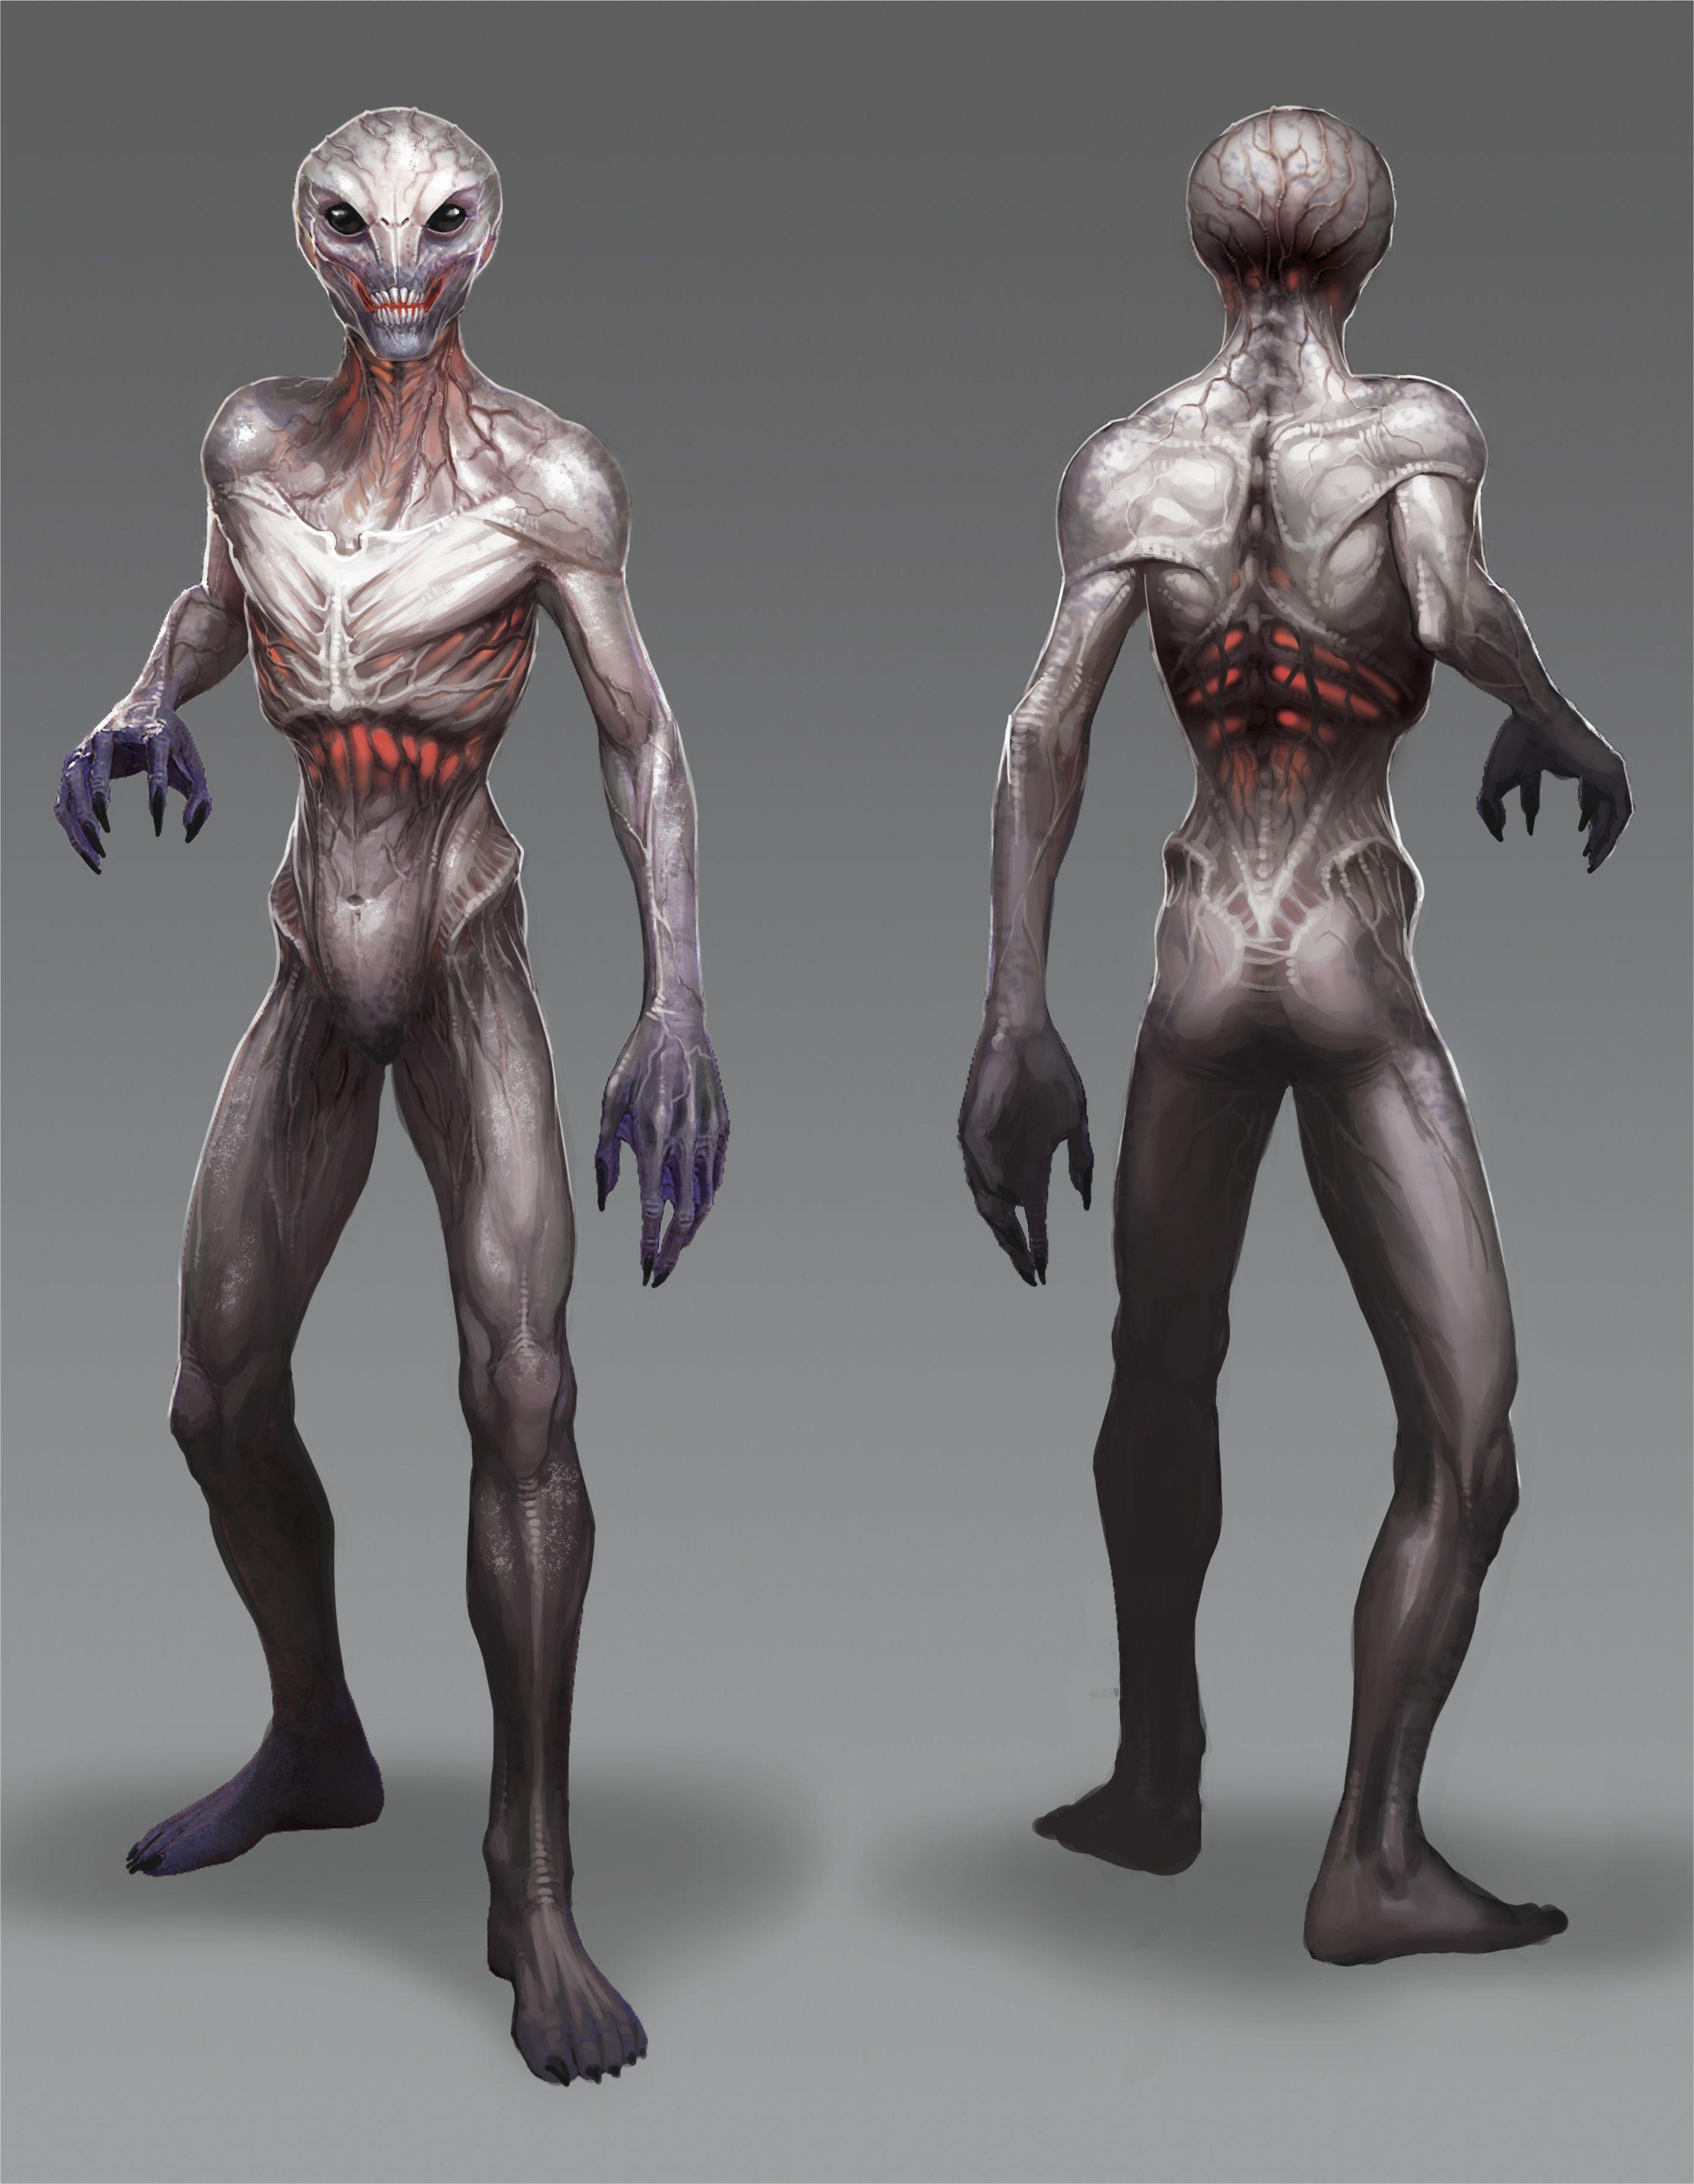 The Concept Art Of Xcom 2 Alien Concept Art Concept Art